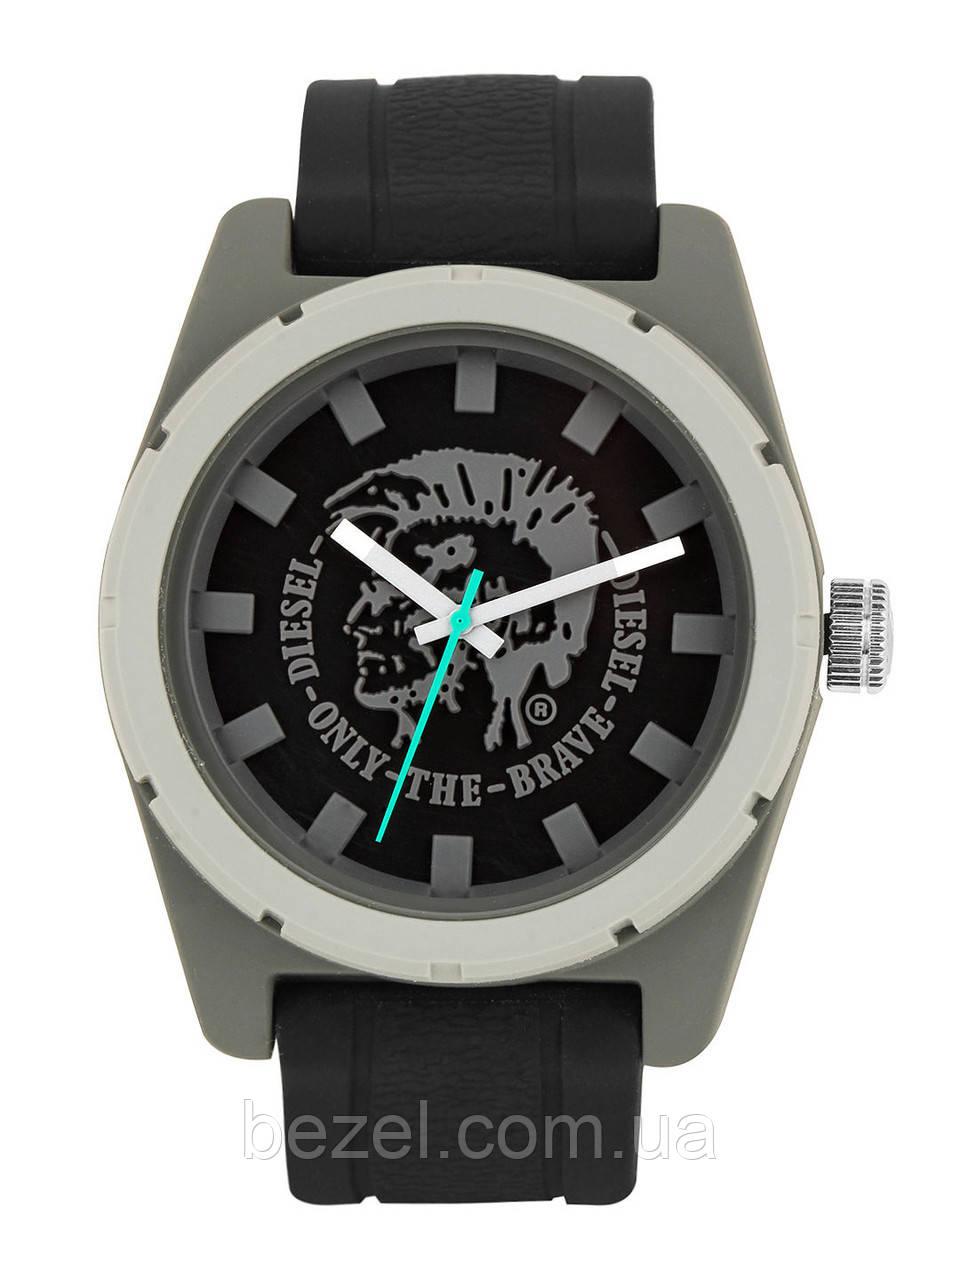 Мужские часы Diesel DZ1624